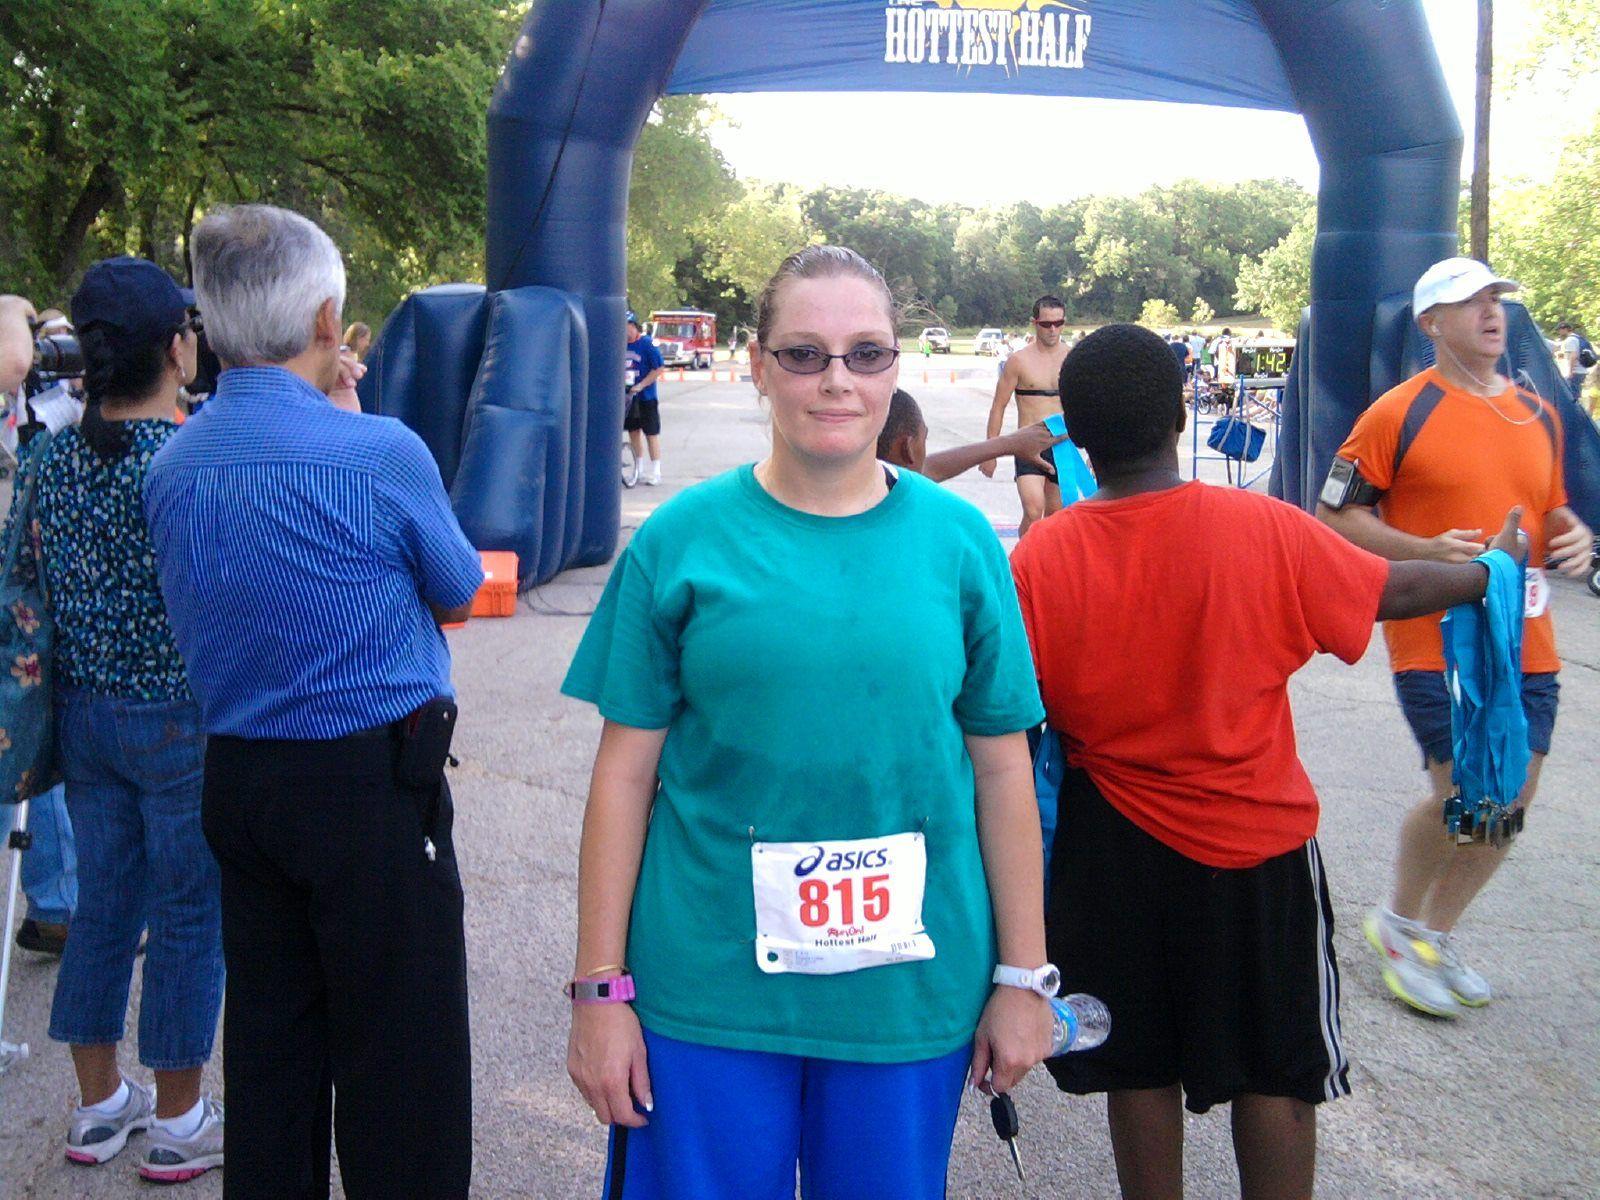 Texas hottest half 2010, ran the 10k